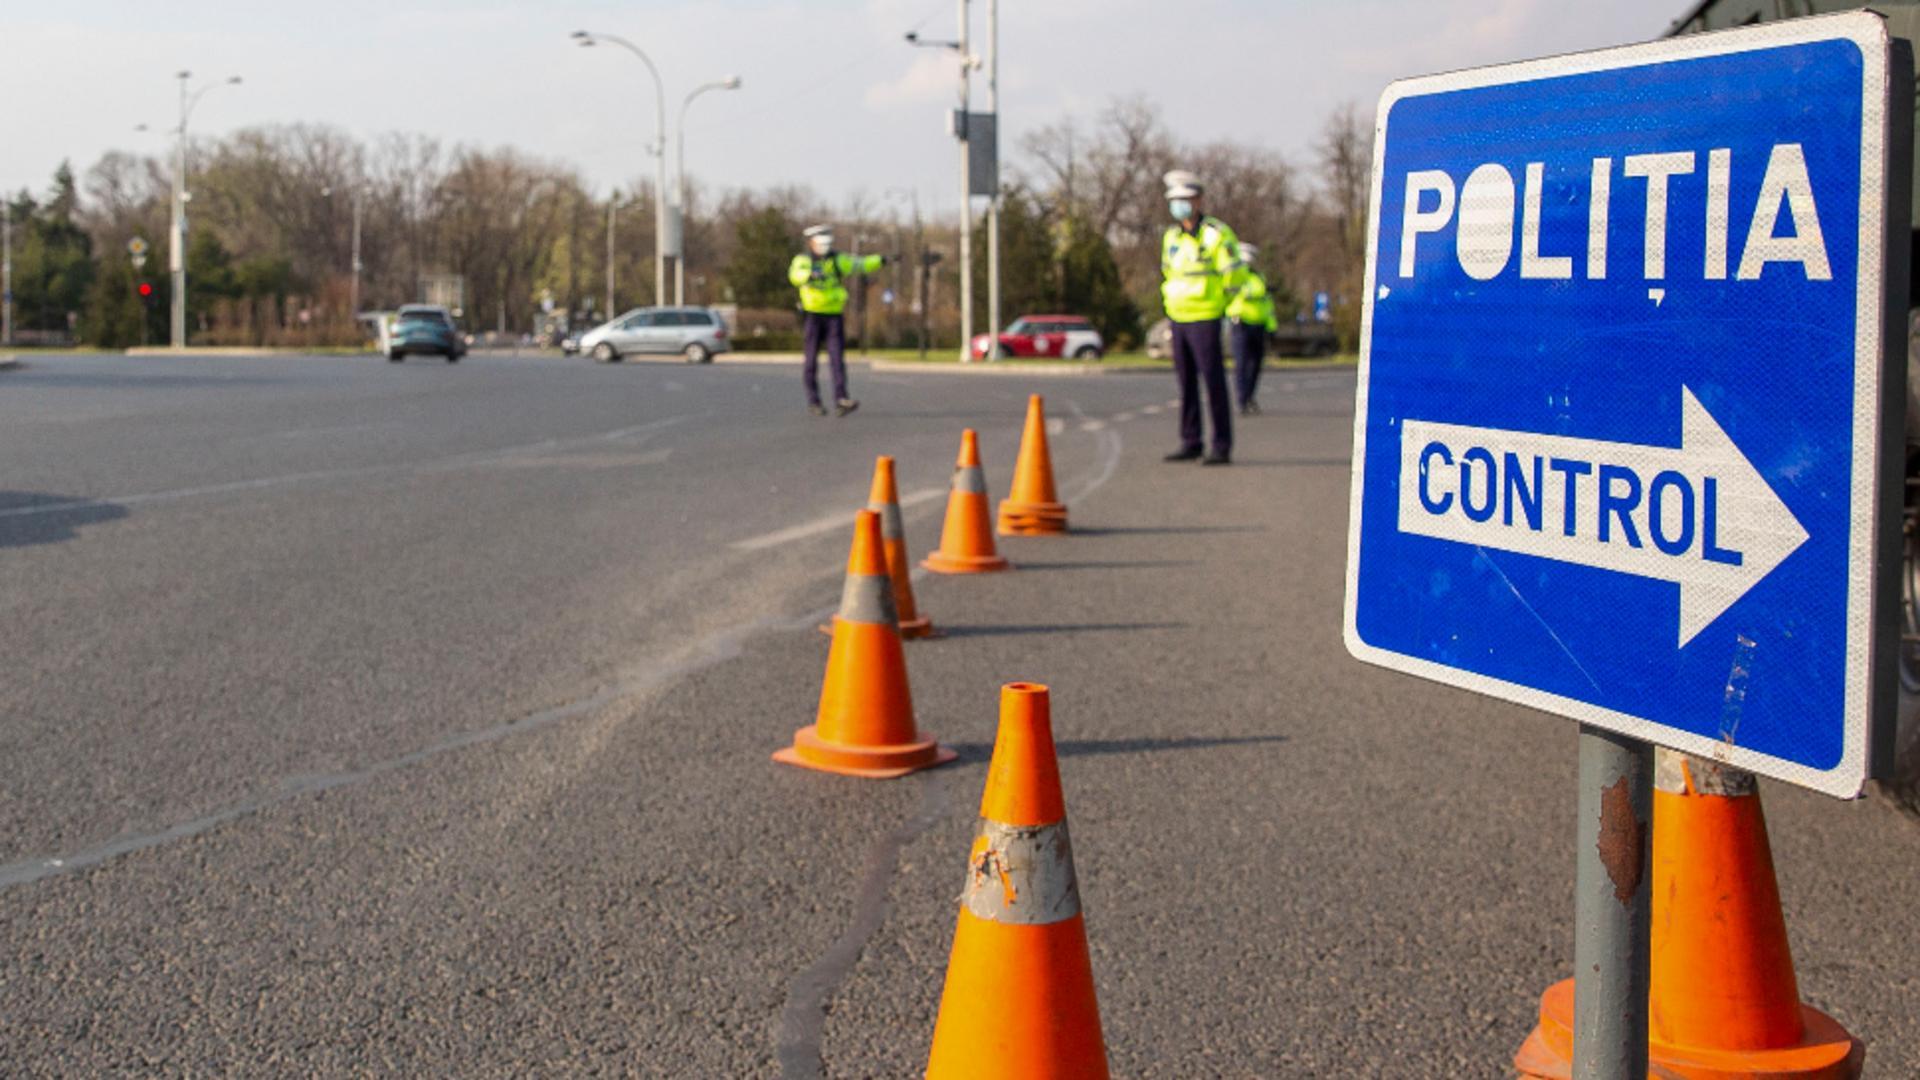 Restricții circulație în jud. Prahova Foto: InquamPhotos/Bogdan-Ioan Buda